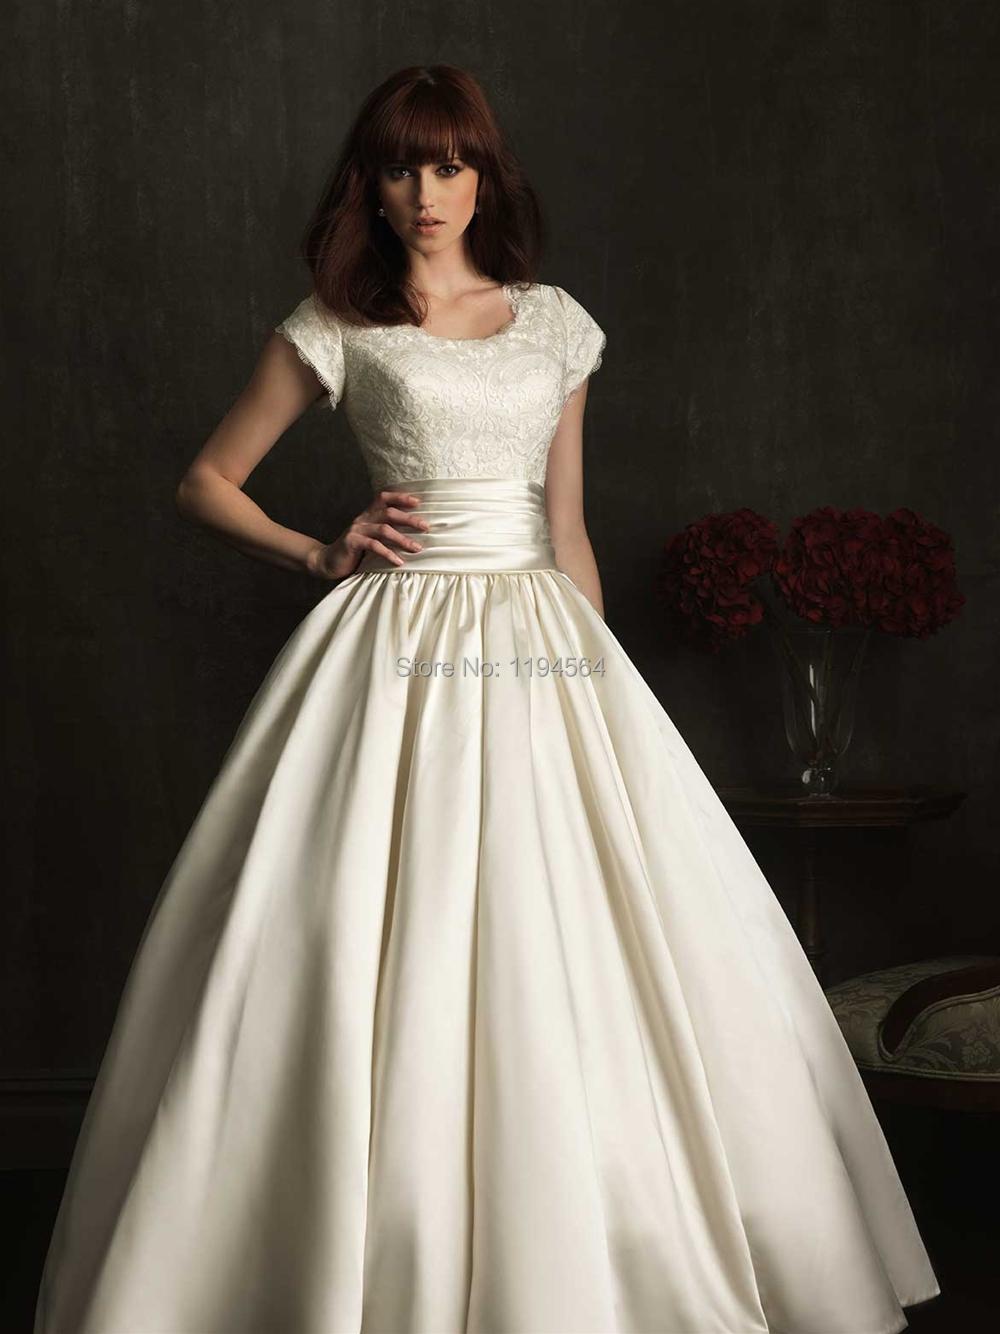 mormon wedding dresses modest wedding dress Photography Gown Bride and Groom Lace Modest Wedding DressesLace DressesFormal